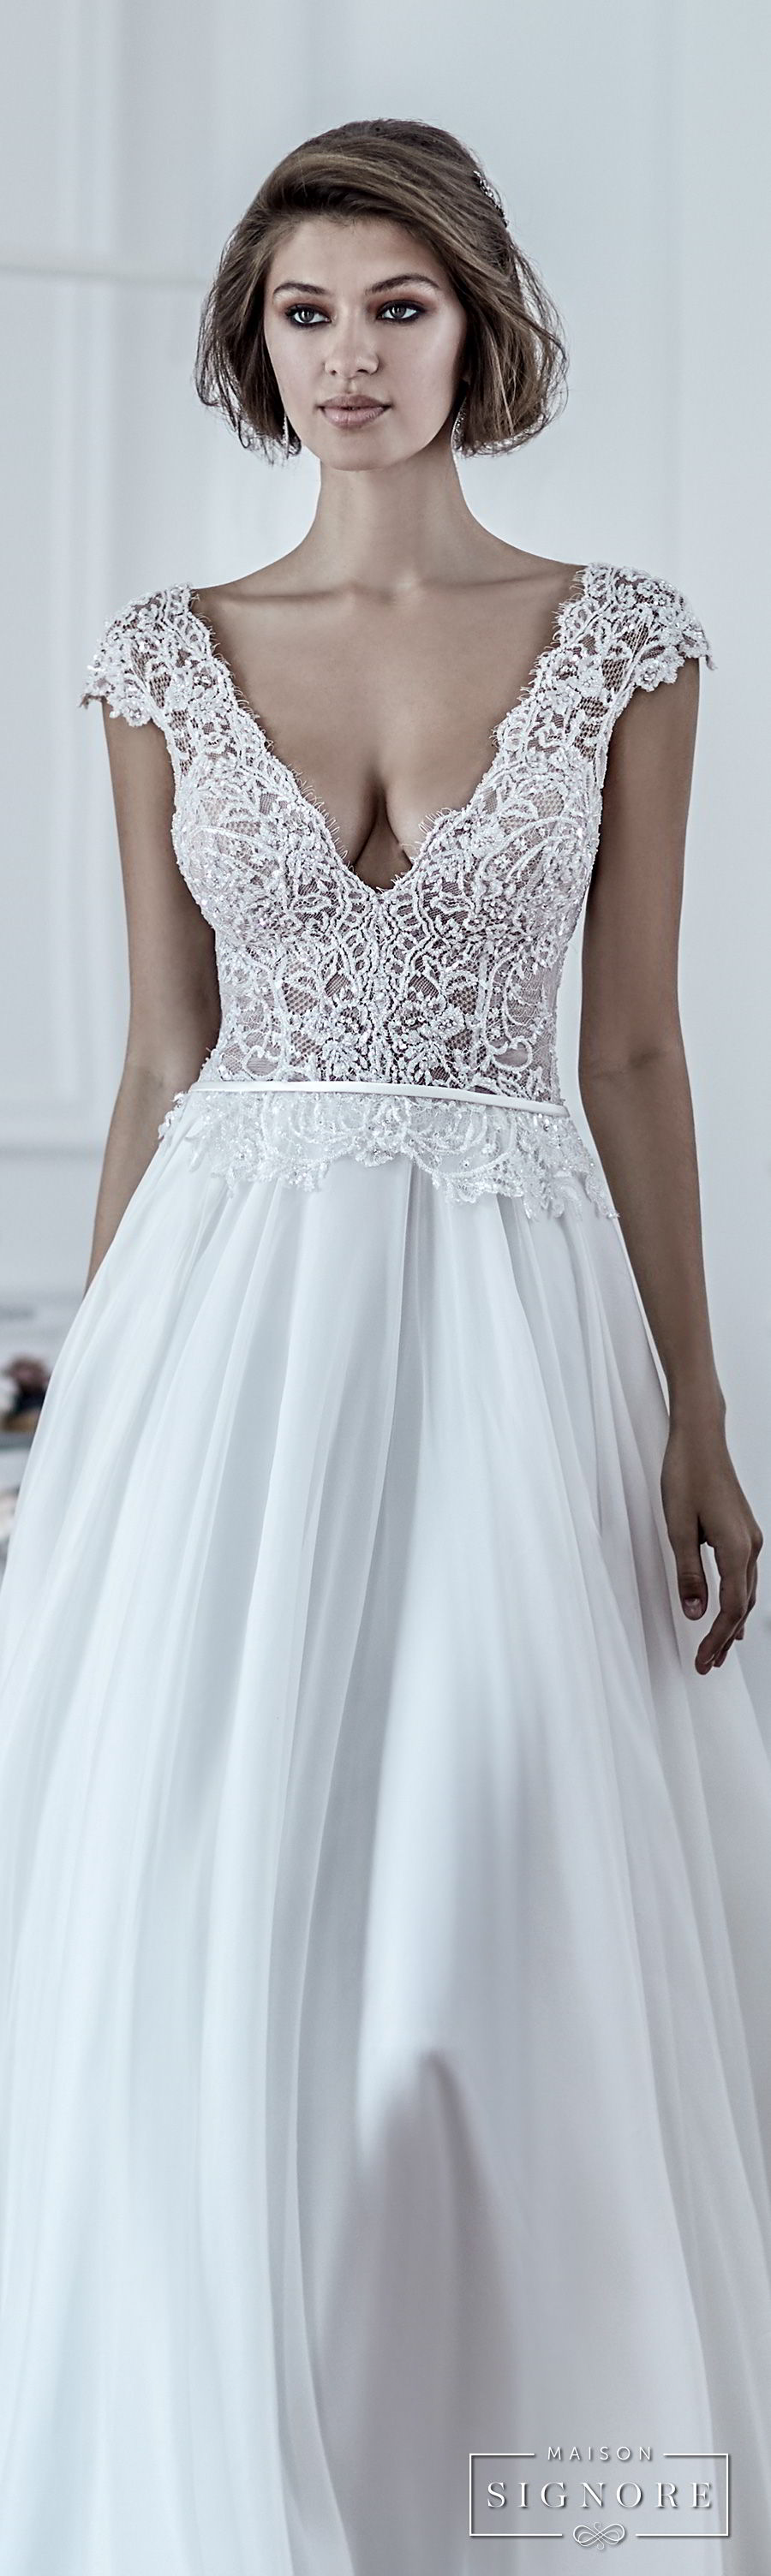 Maison Signore\'s Stunning 2018 Wedding Dresses – OBSiGeN